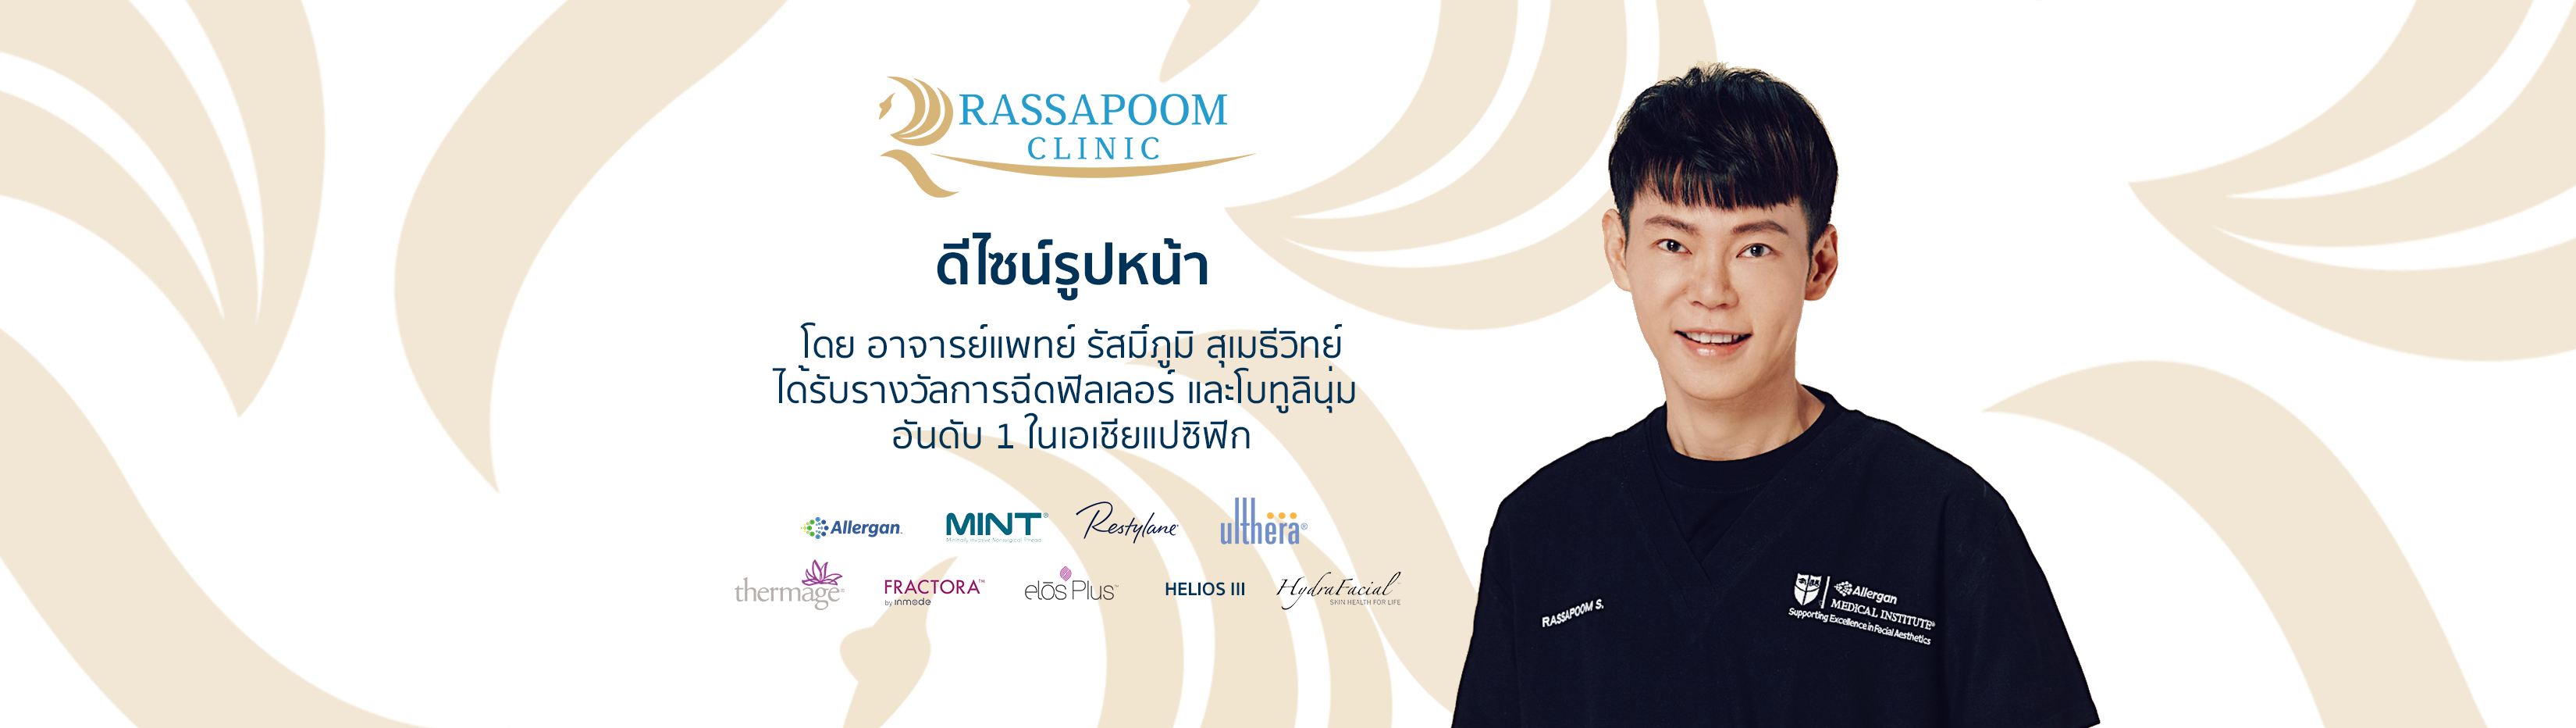 rassapoom-skin-clinic-filler